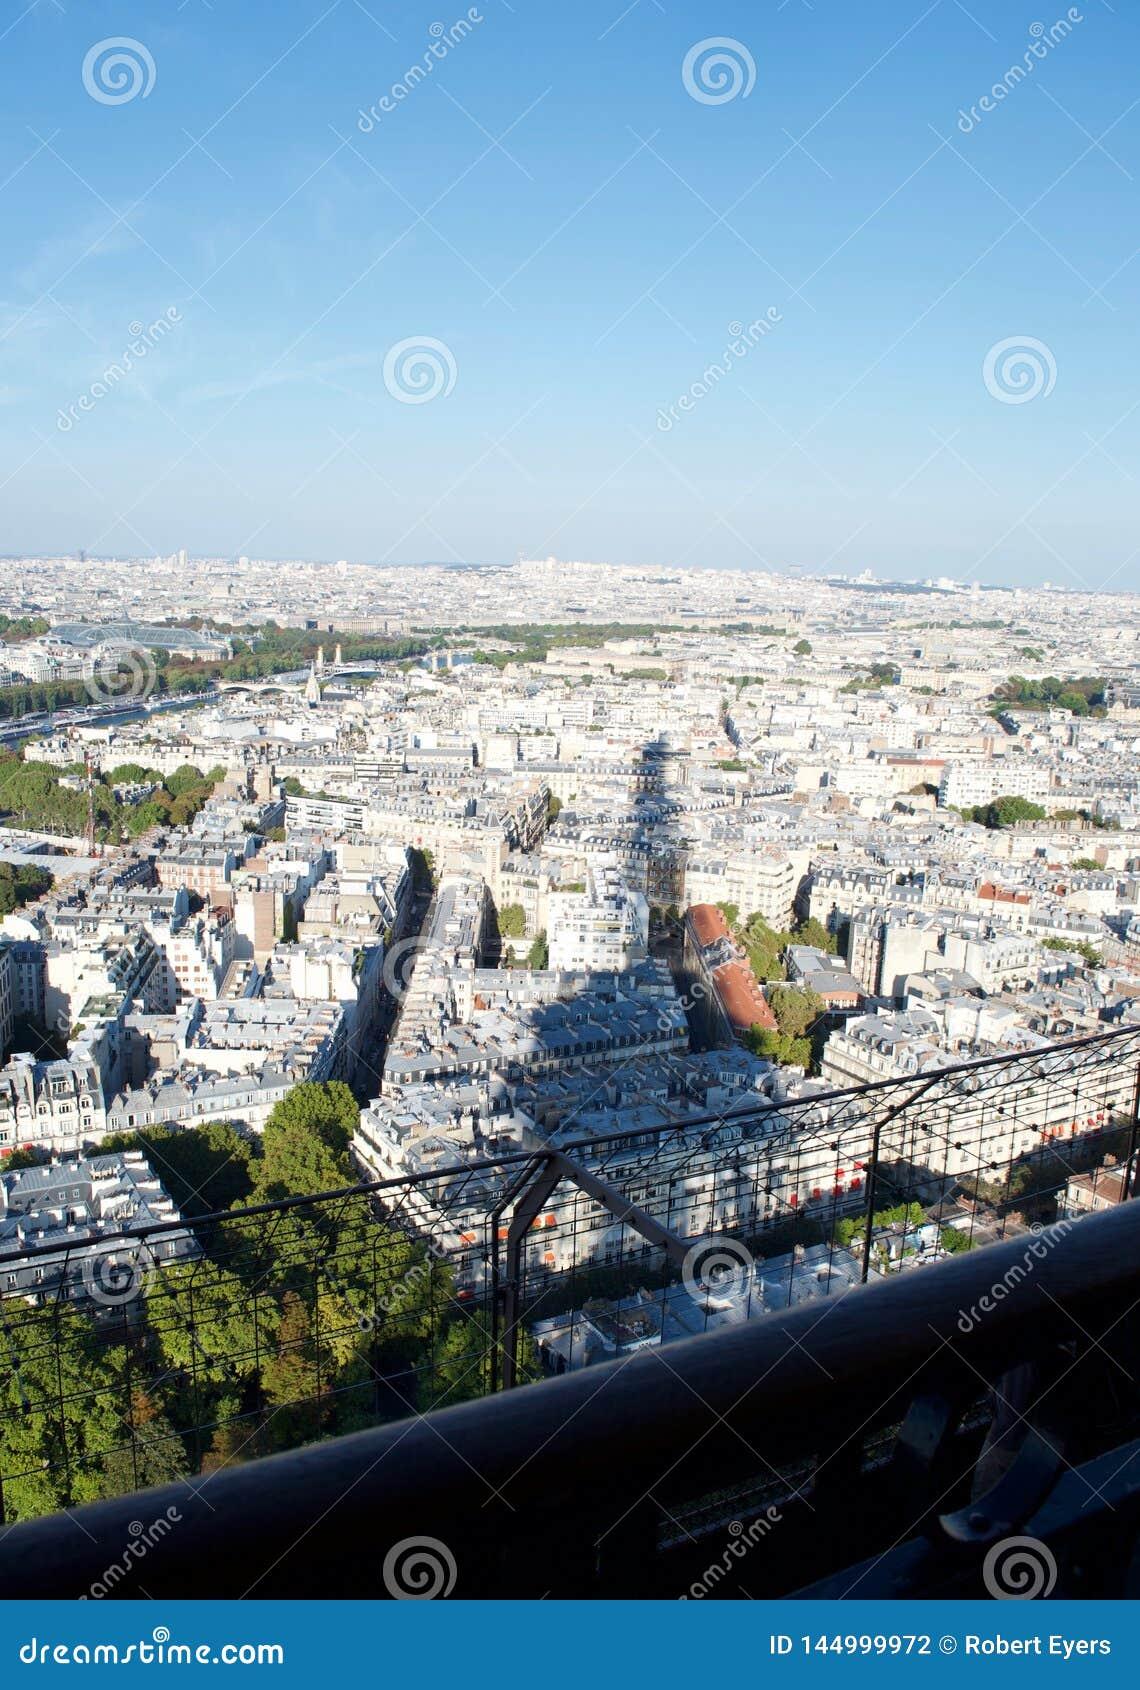 Shadow of Eiffel tower on sunlit Paris France below